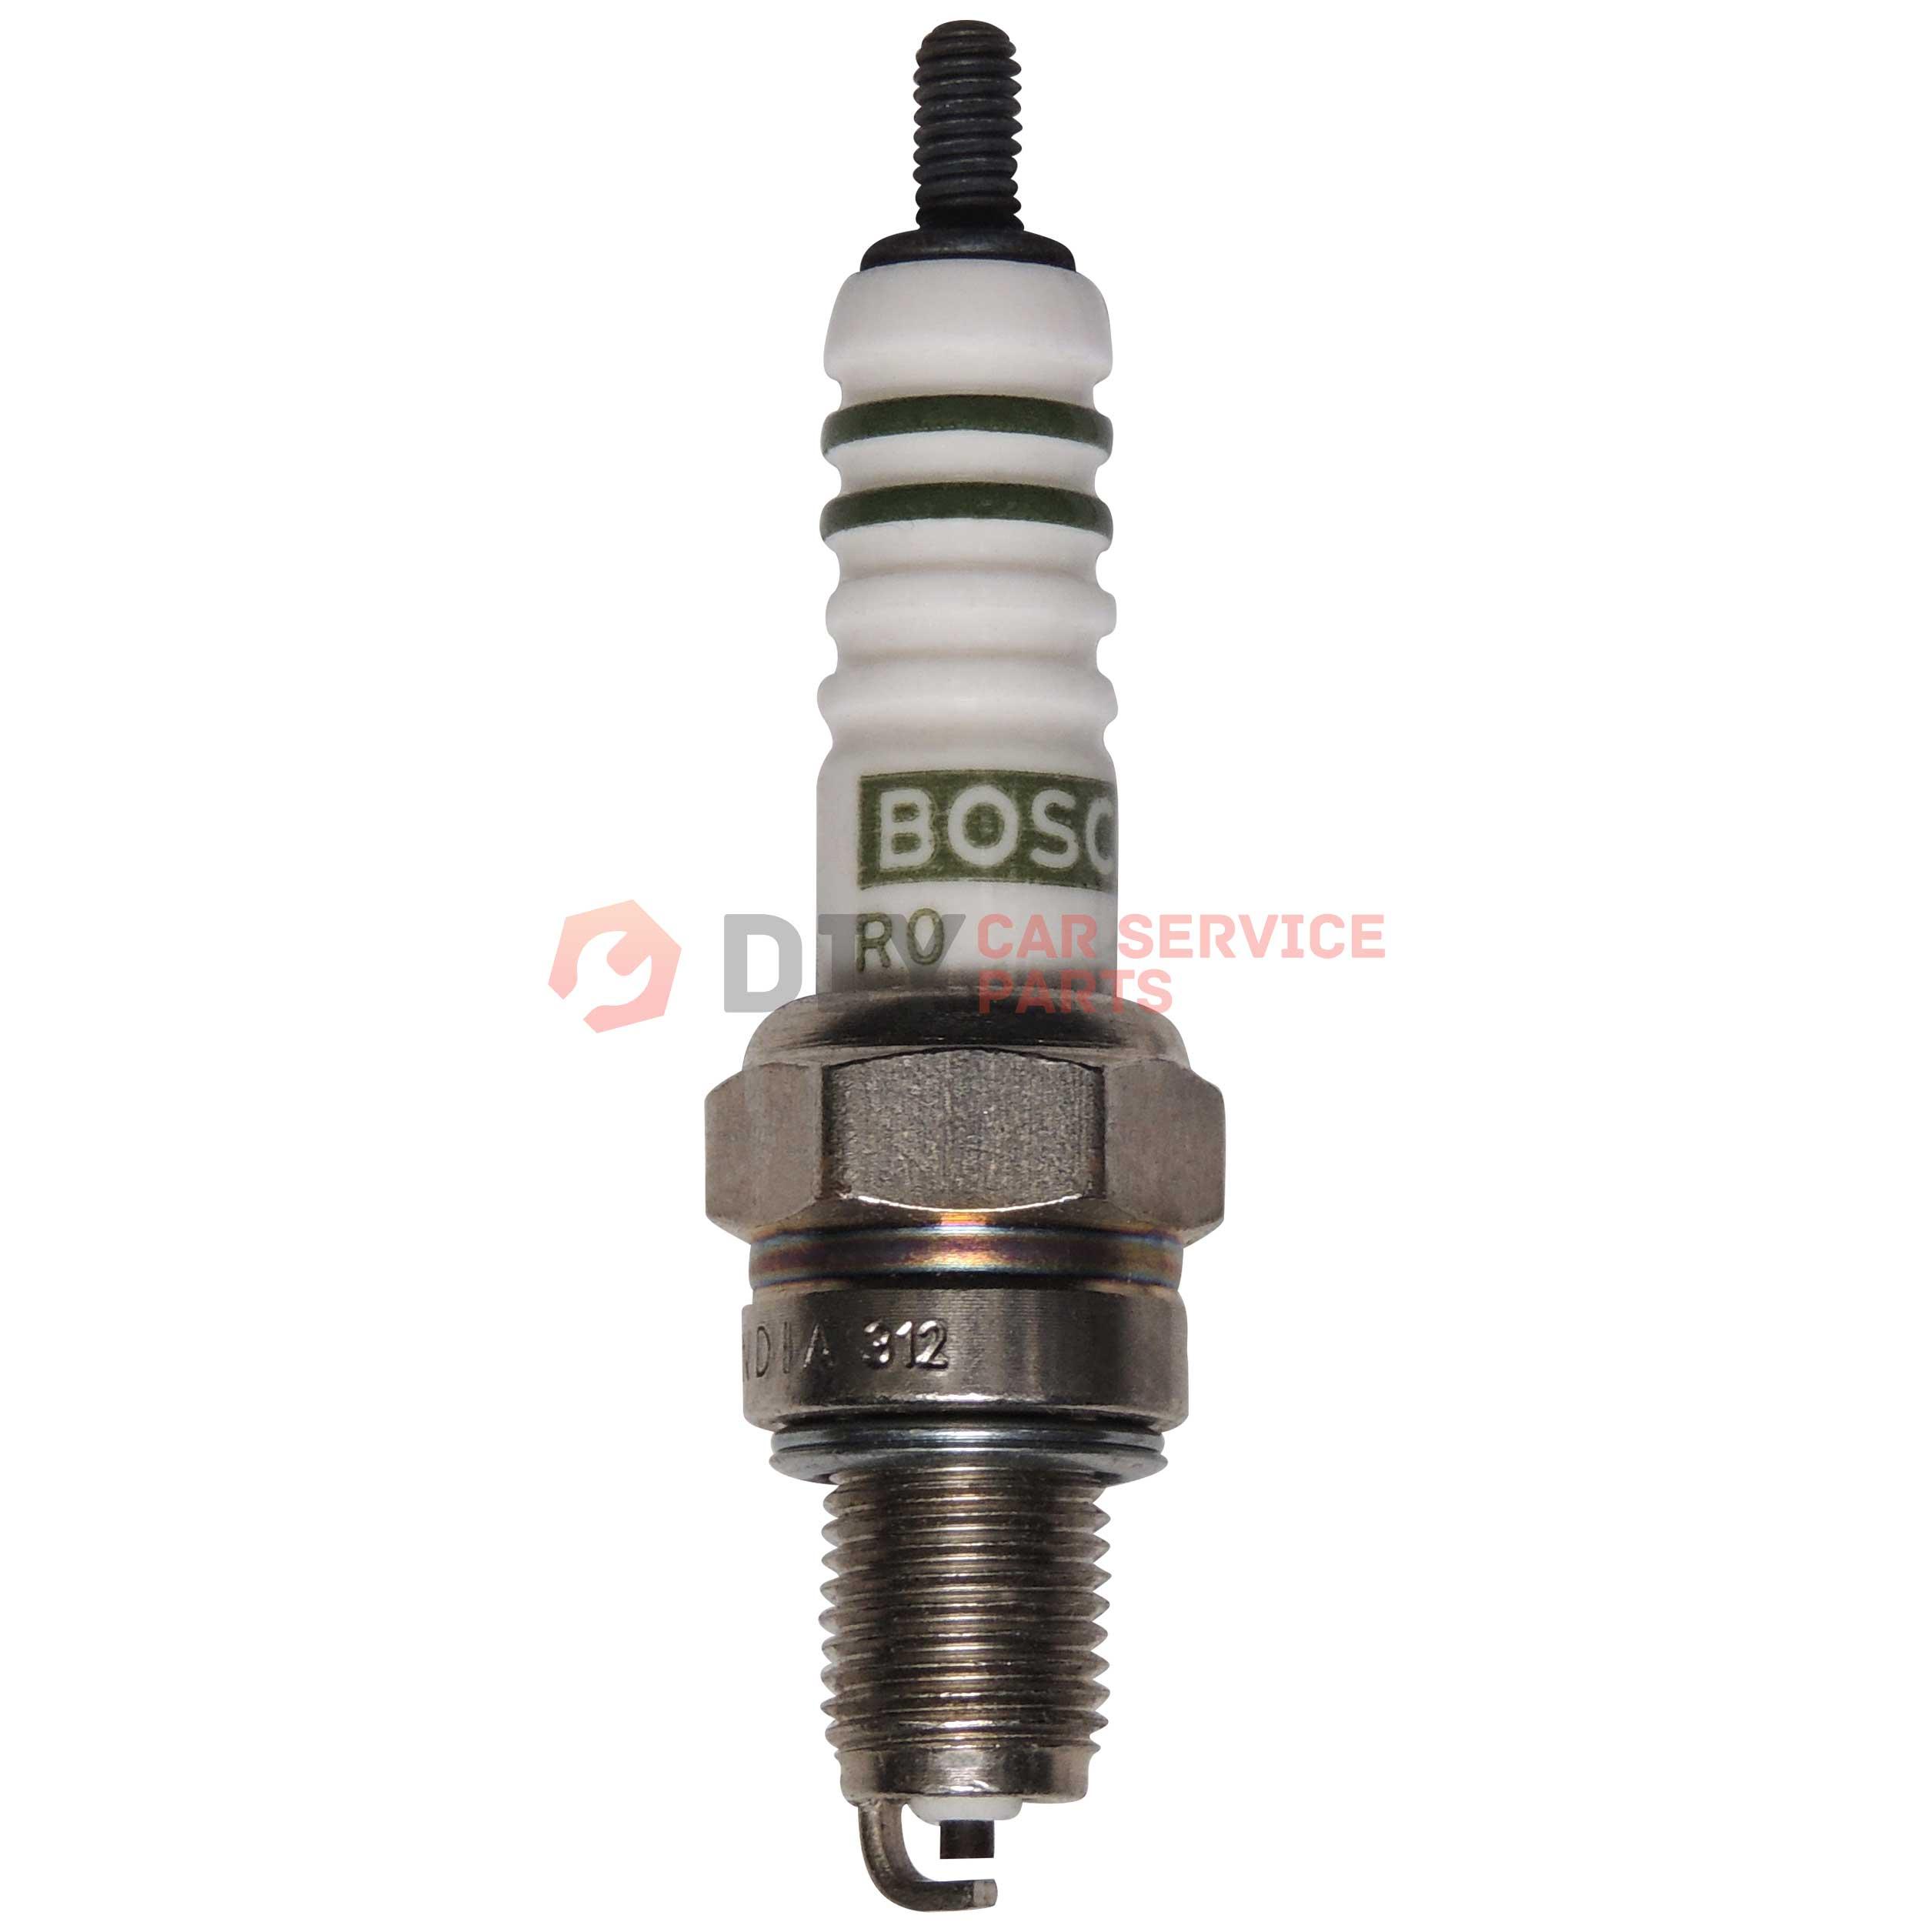 Genuine OE BOSCH 0242240627 FR6KPP332S DOUBLE PLATINUM Spark Plug 10 Pack